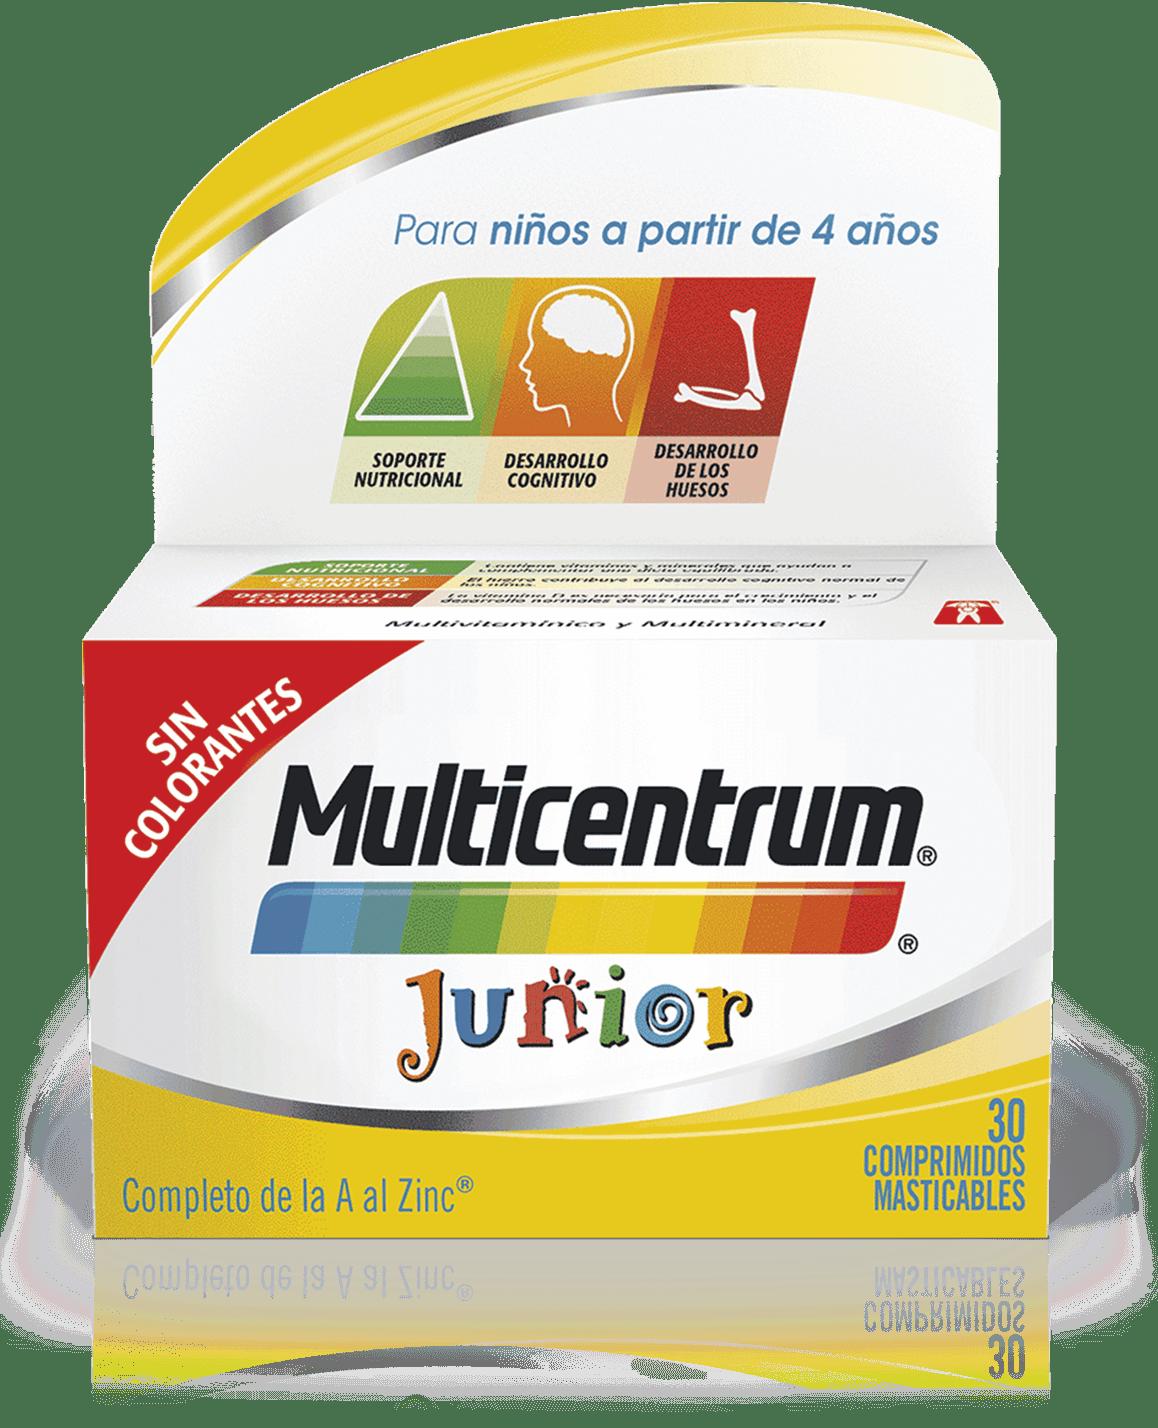 Imagen de producto de Multicentrum VitaSoftGums